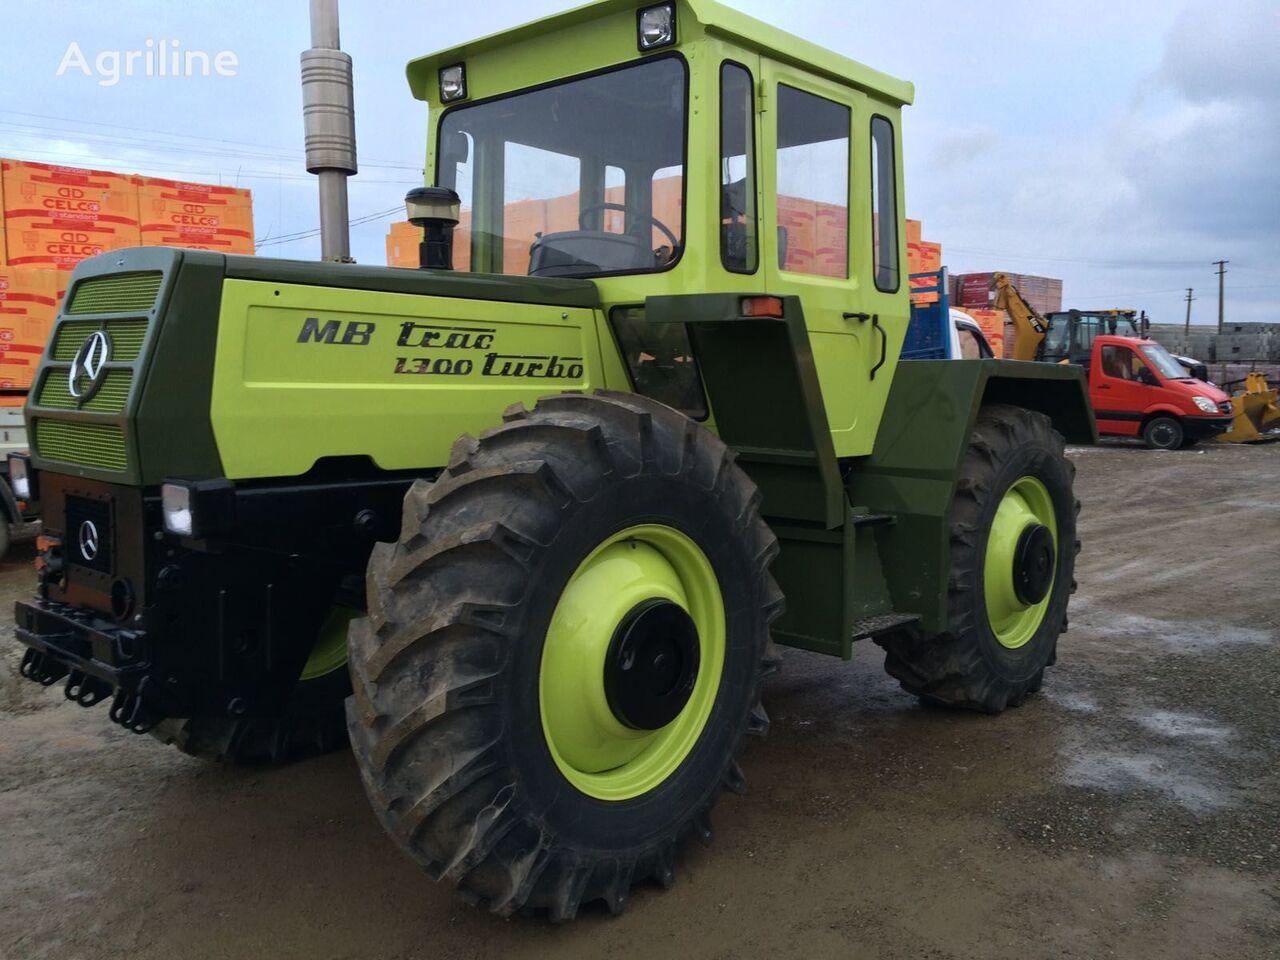 MB TRAC 1300 tekerlekli traktör